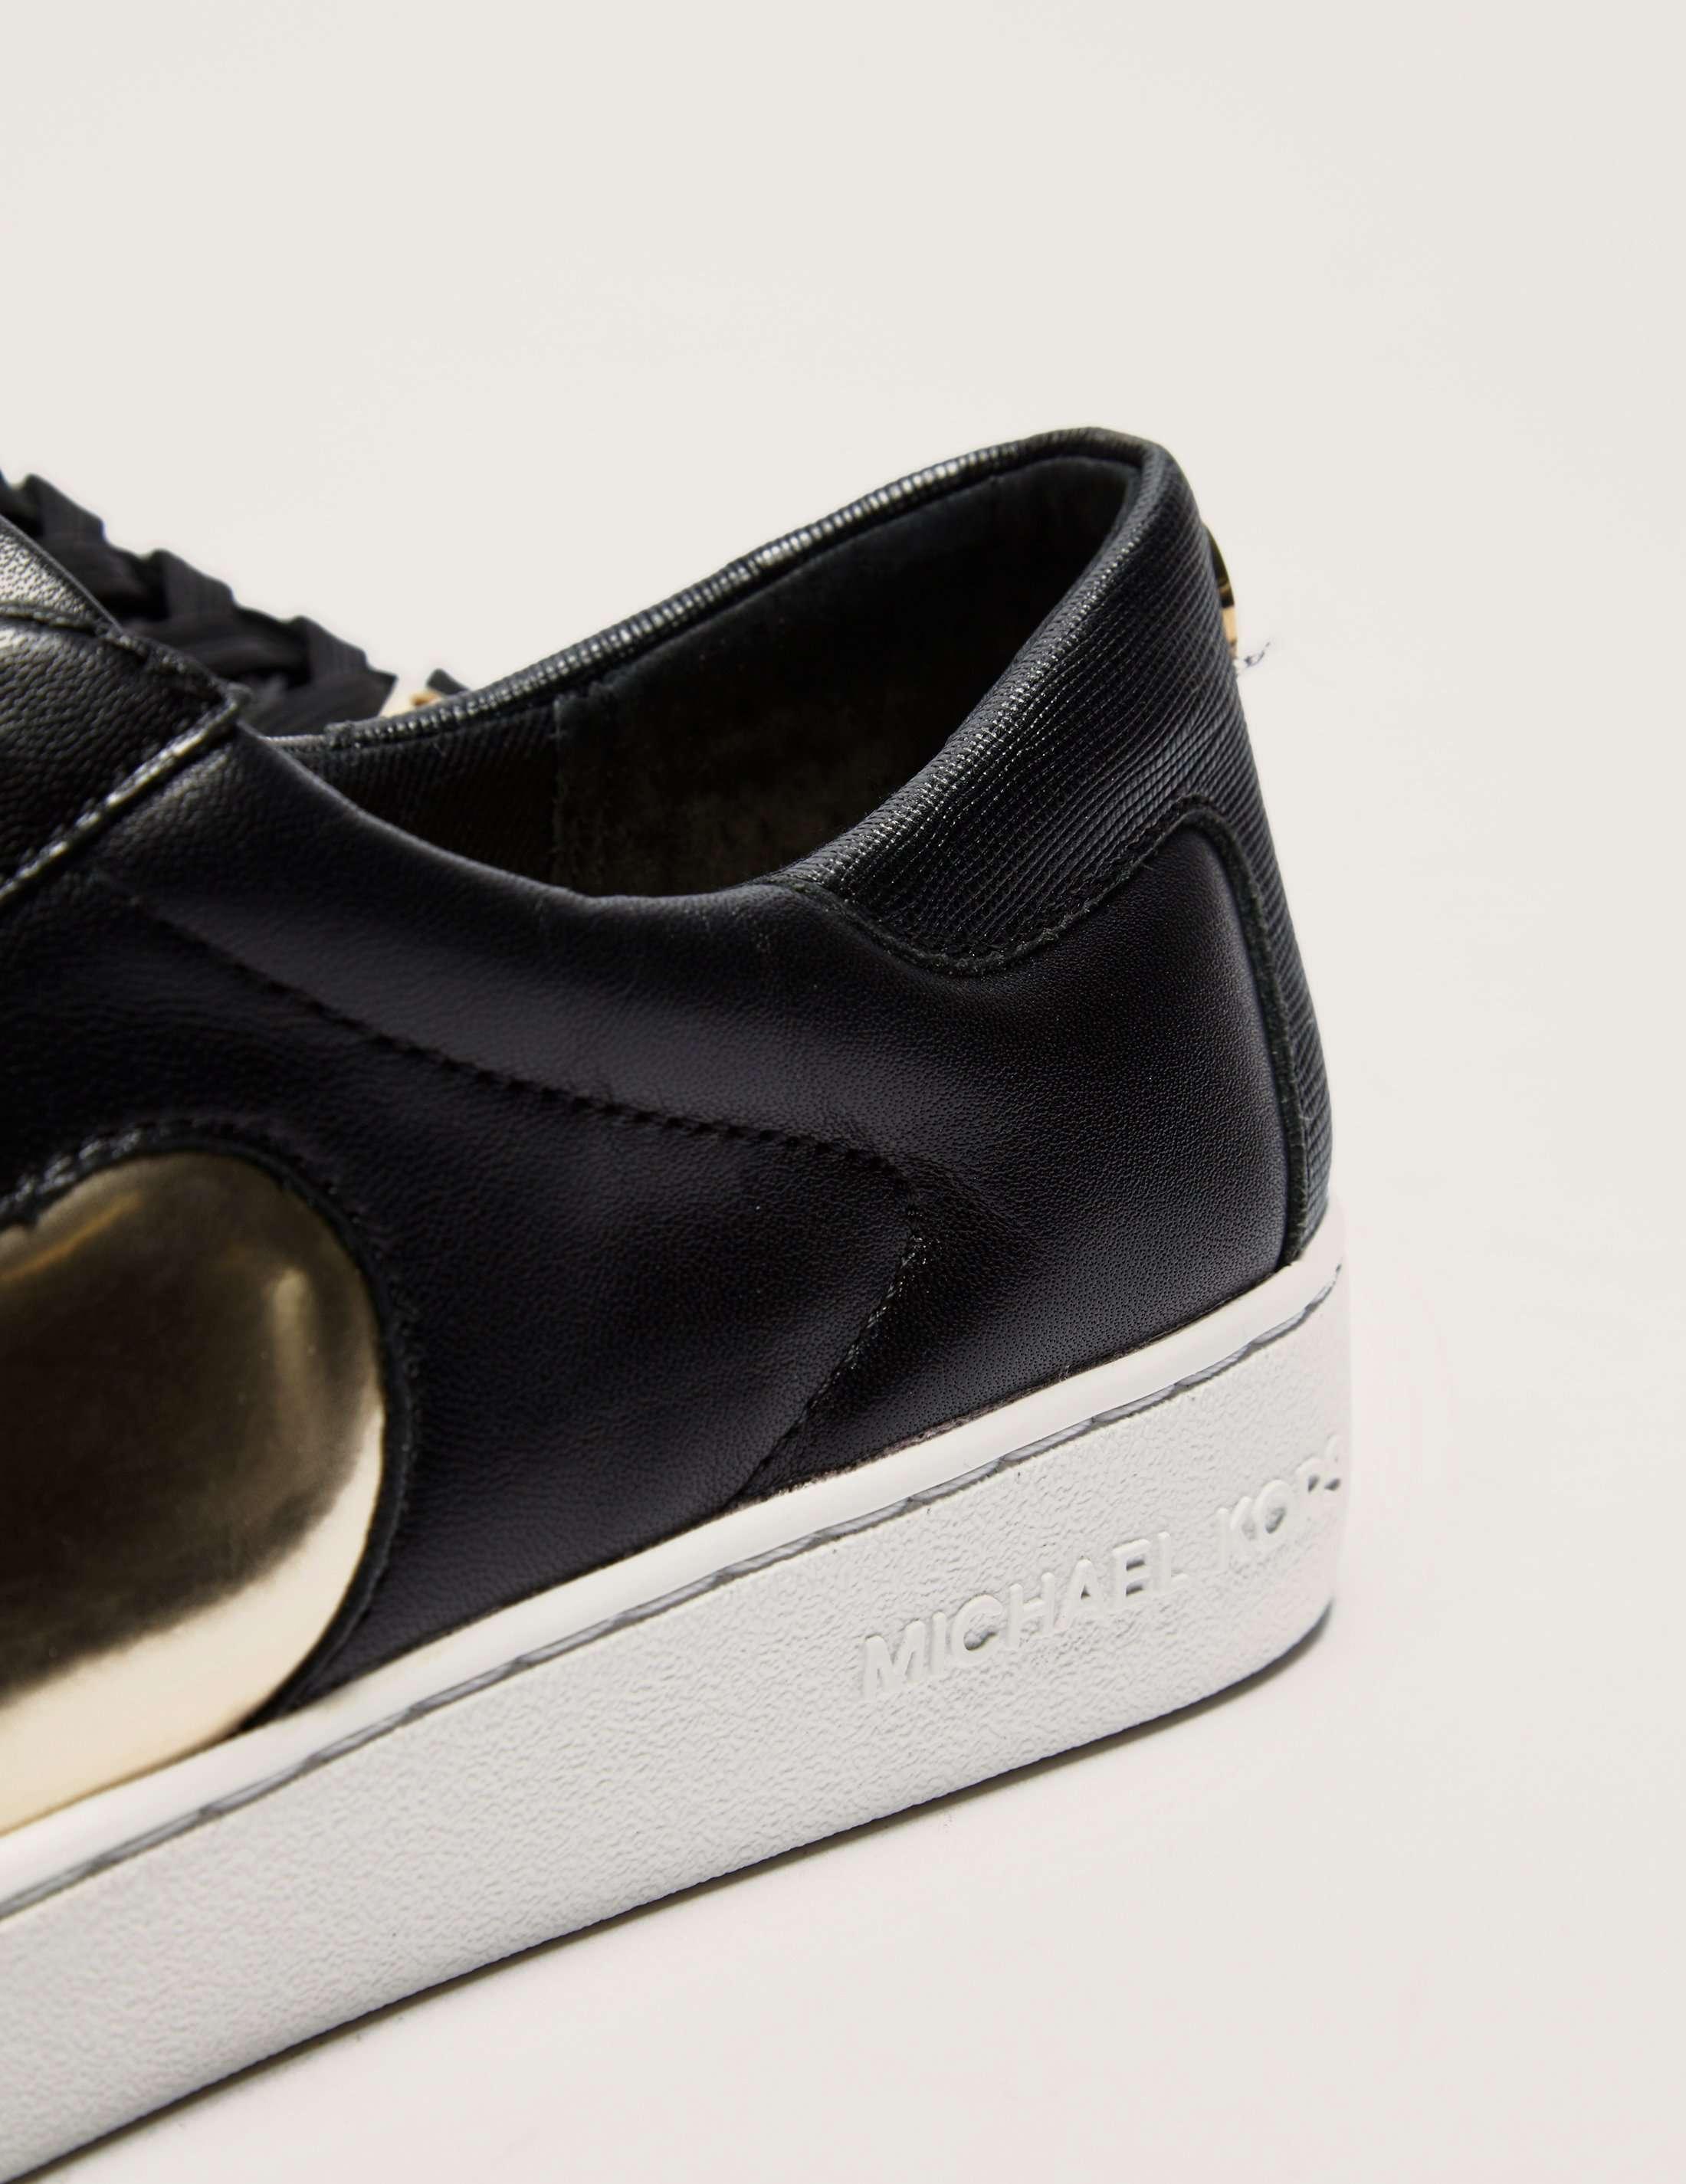 Michael Kors Keaton Heart Sneaker